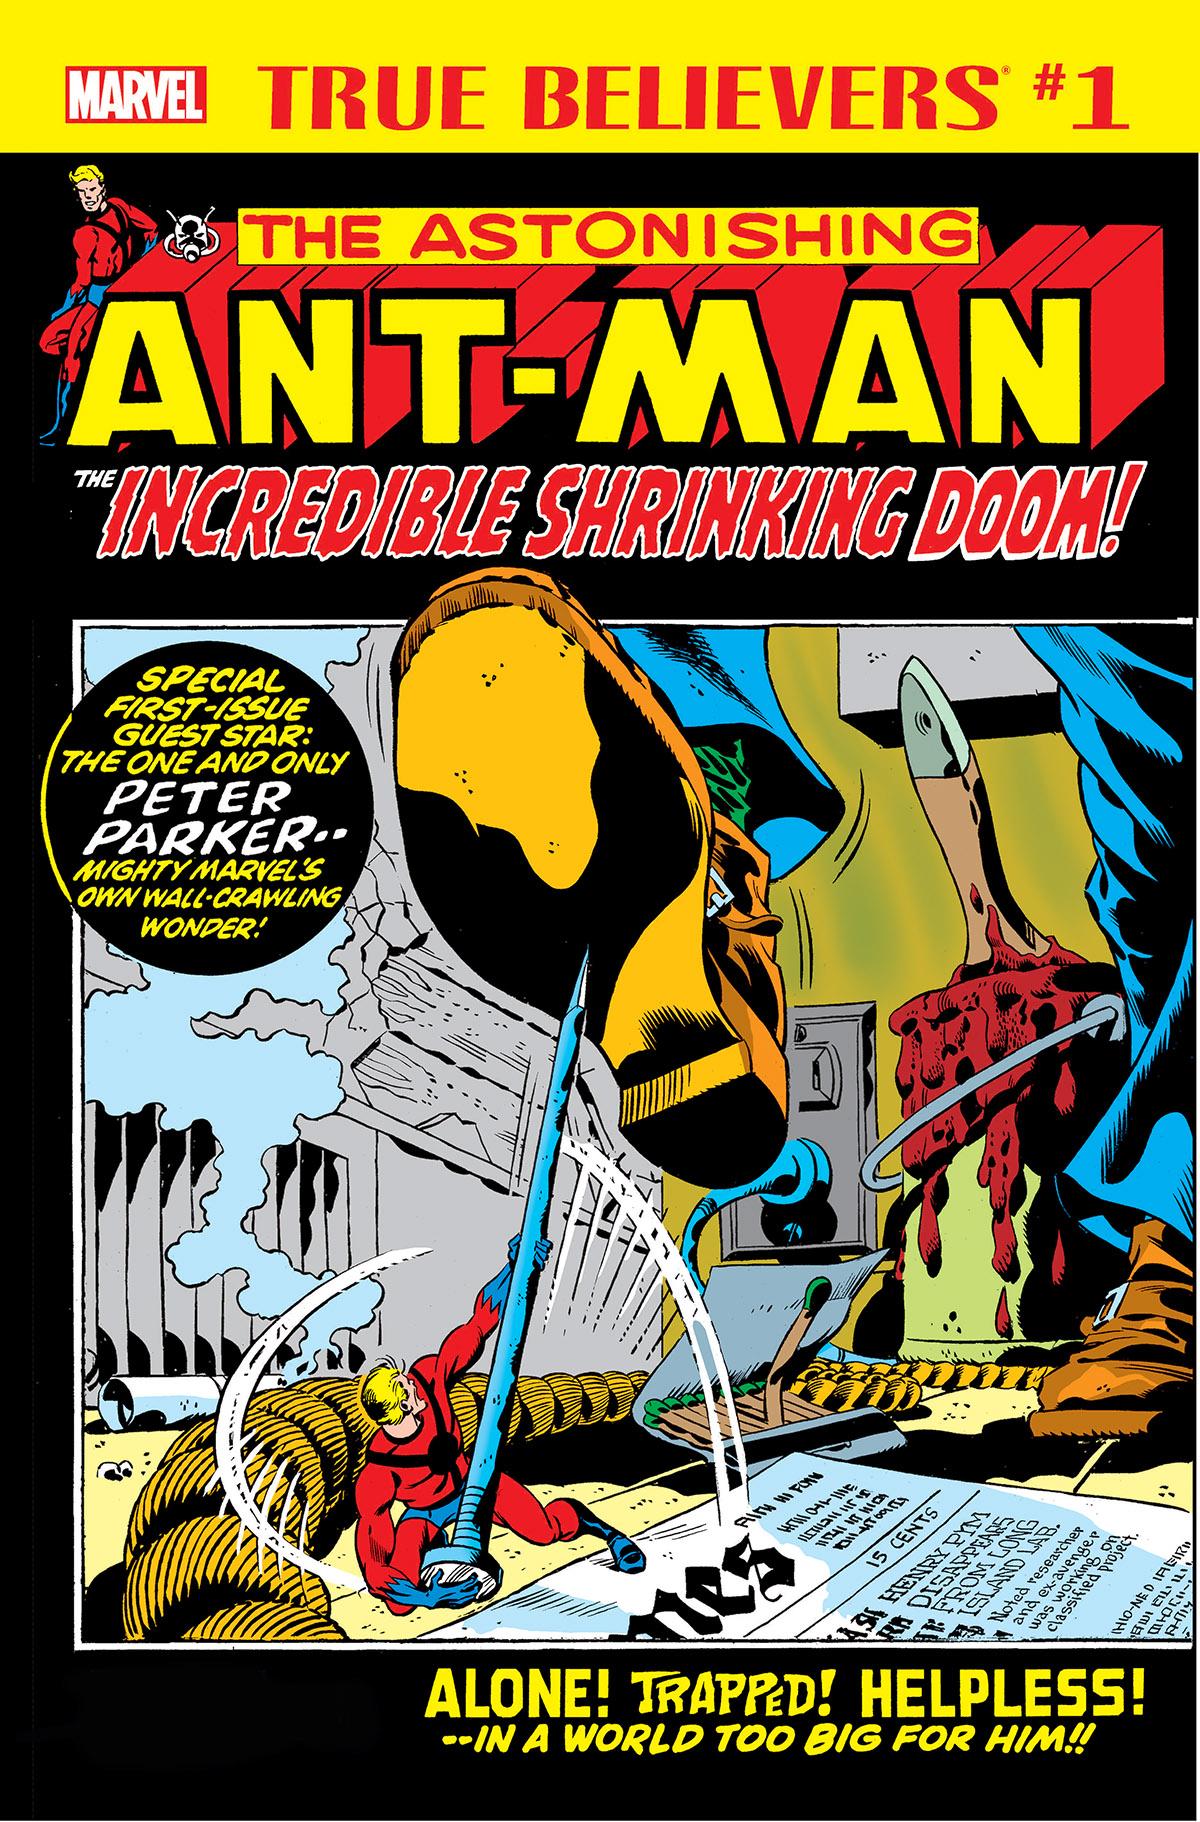 True Believers: Ant-Man - The Incredible Shrinking Doom (2018) #1